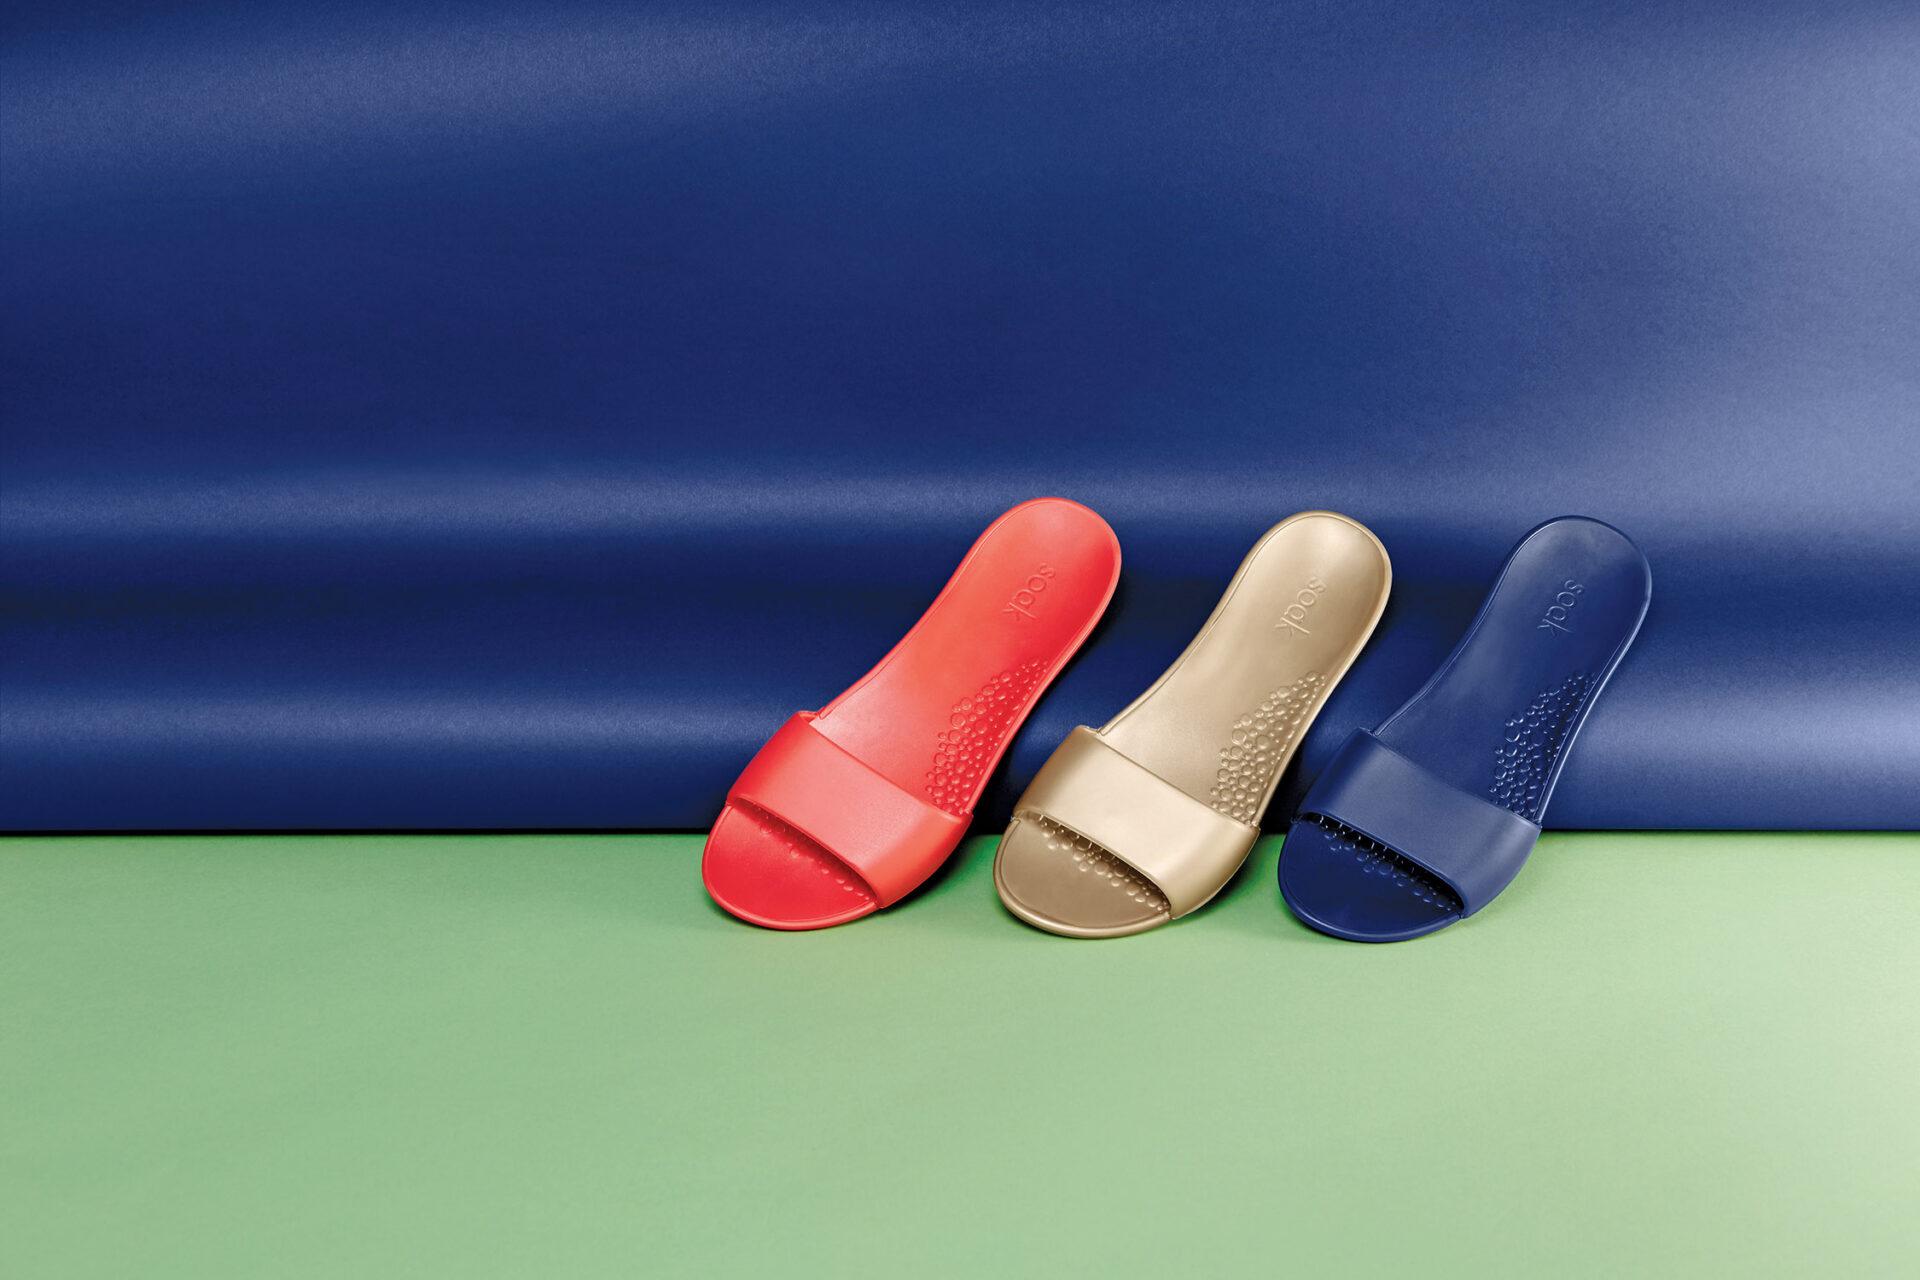 Soak-elena-corsano-christie-galeano-sandals-flip-flops-city-cool-fort-lauderdale-venice